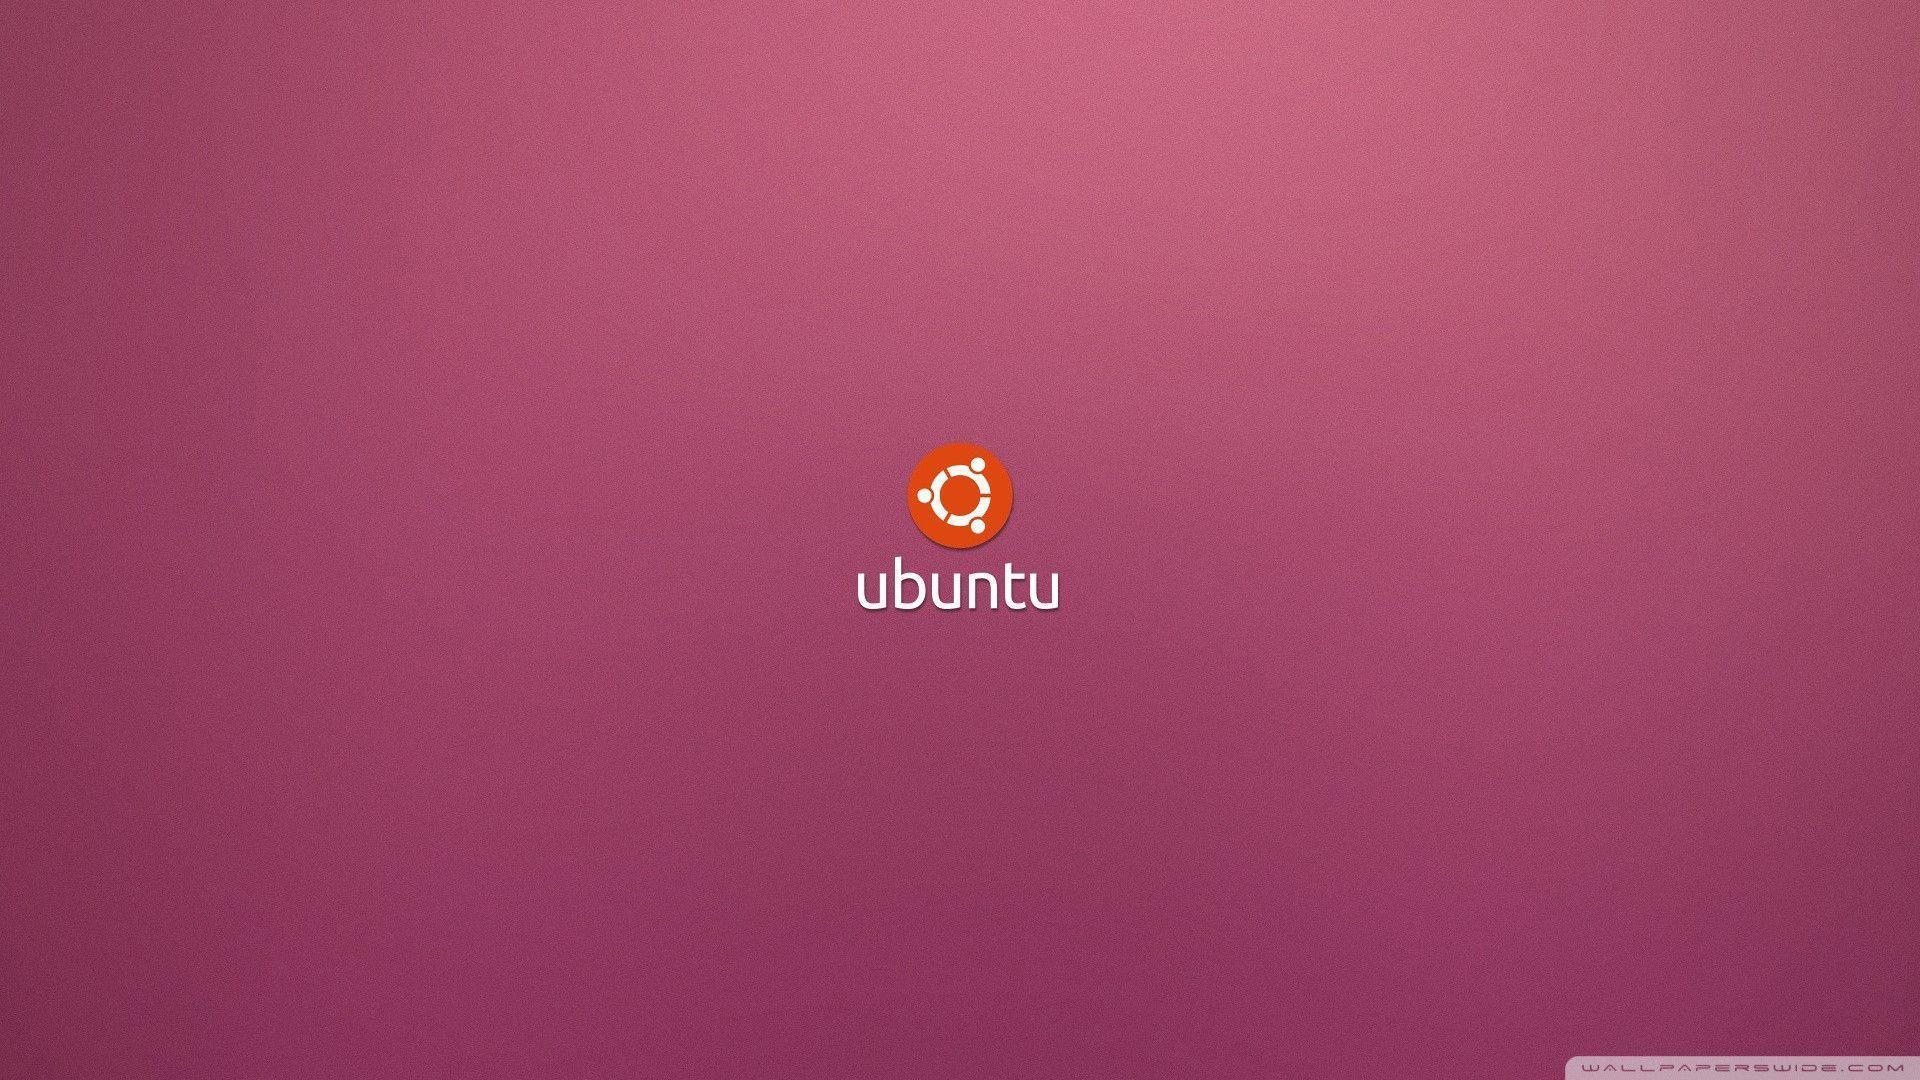 ubuntu pink and black - photo #6